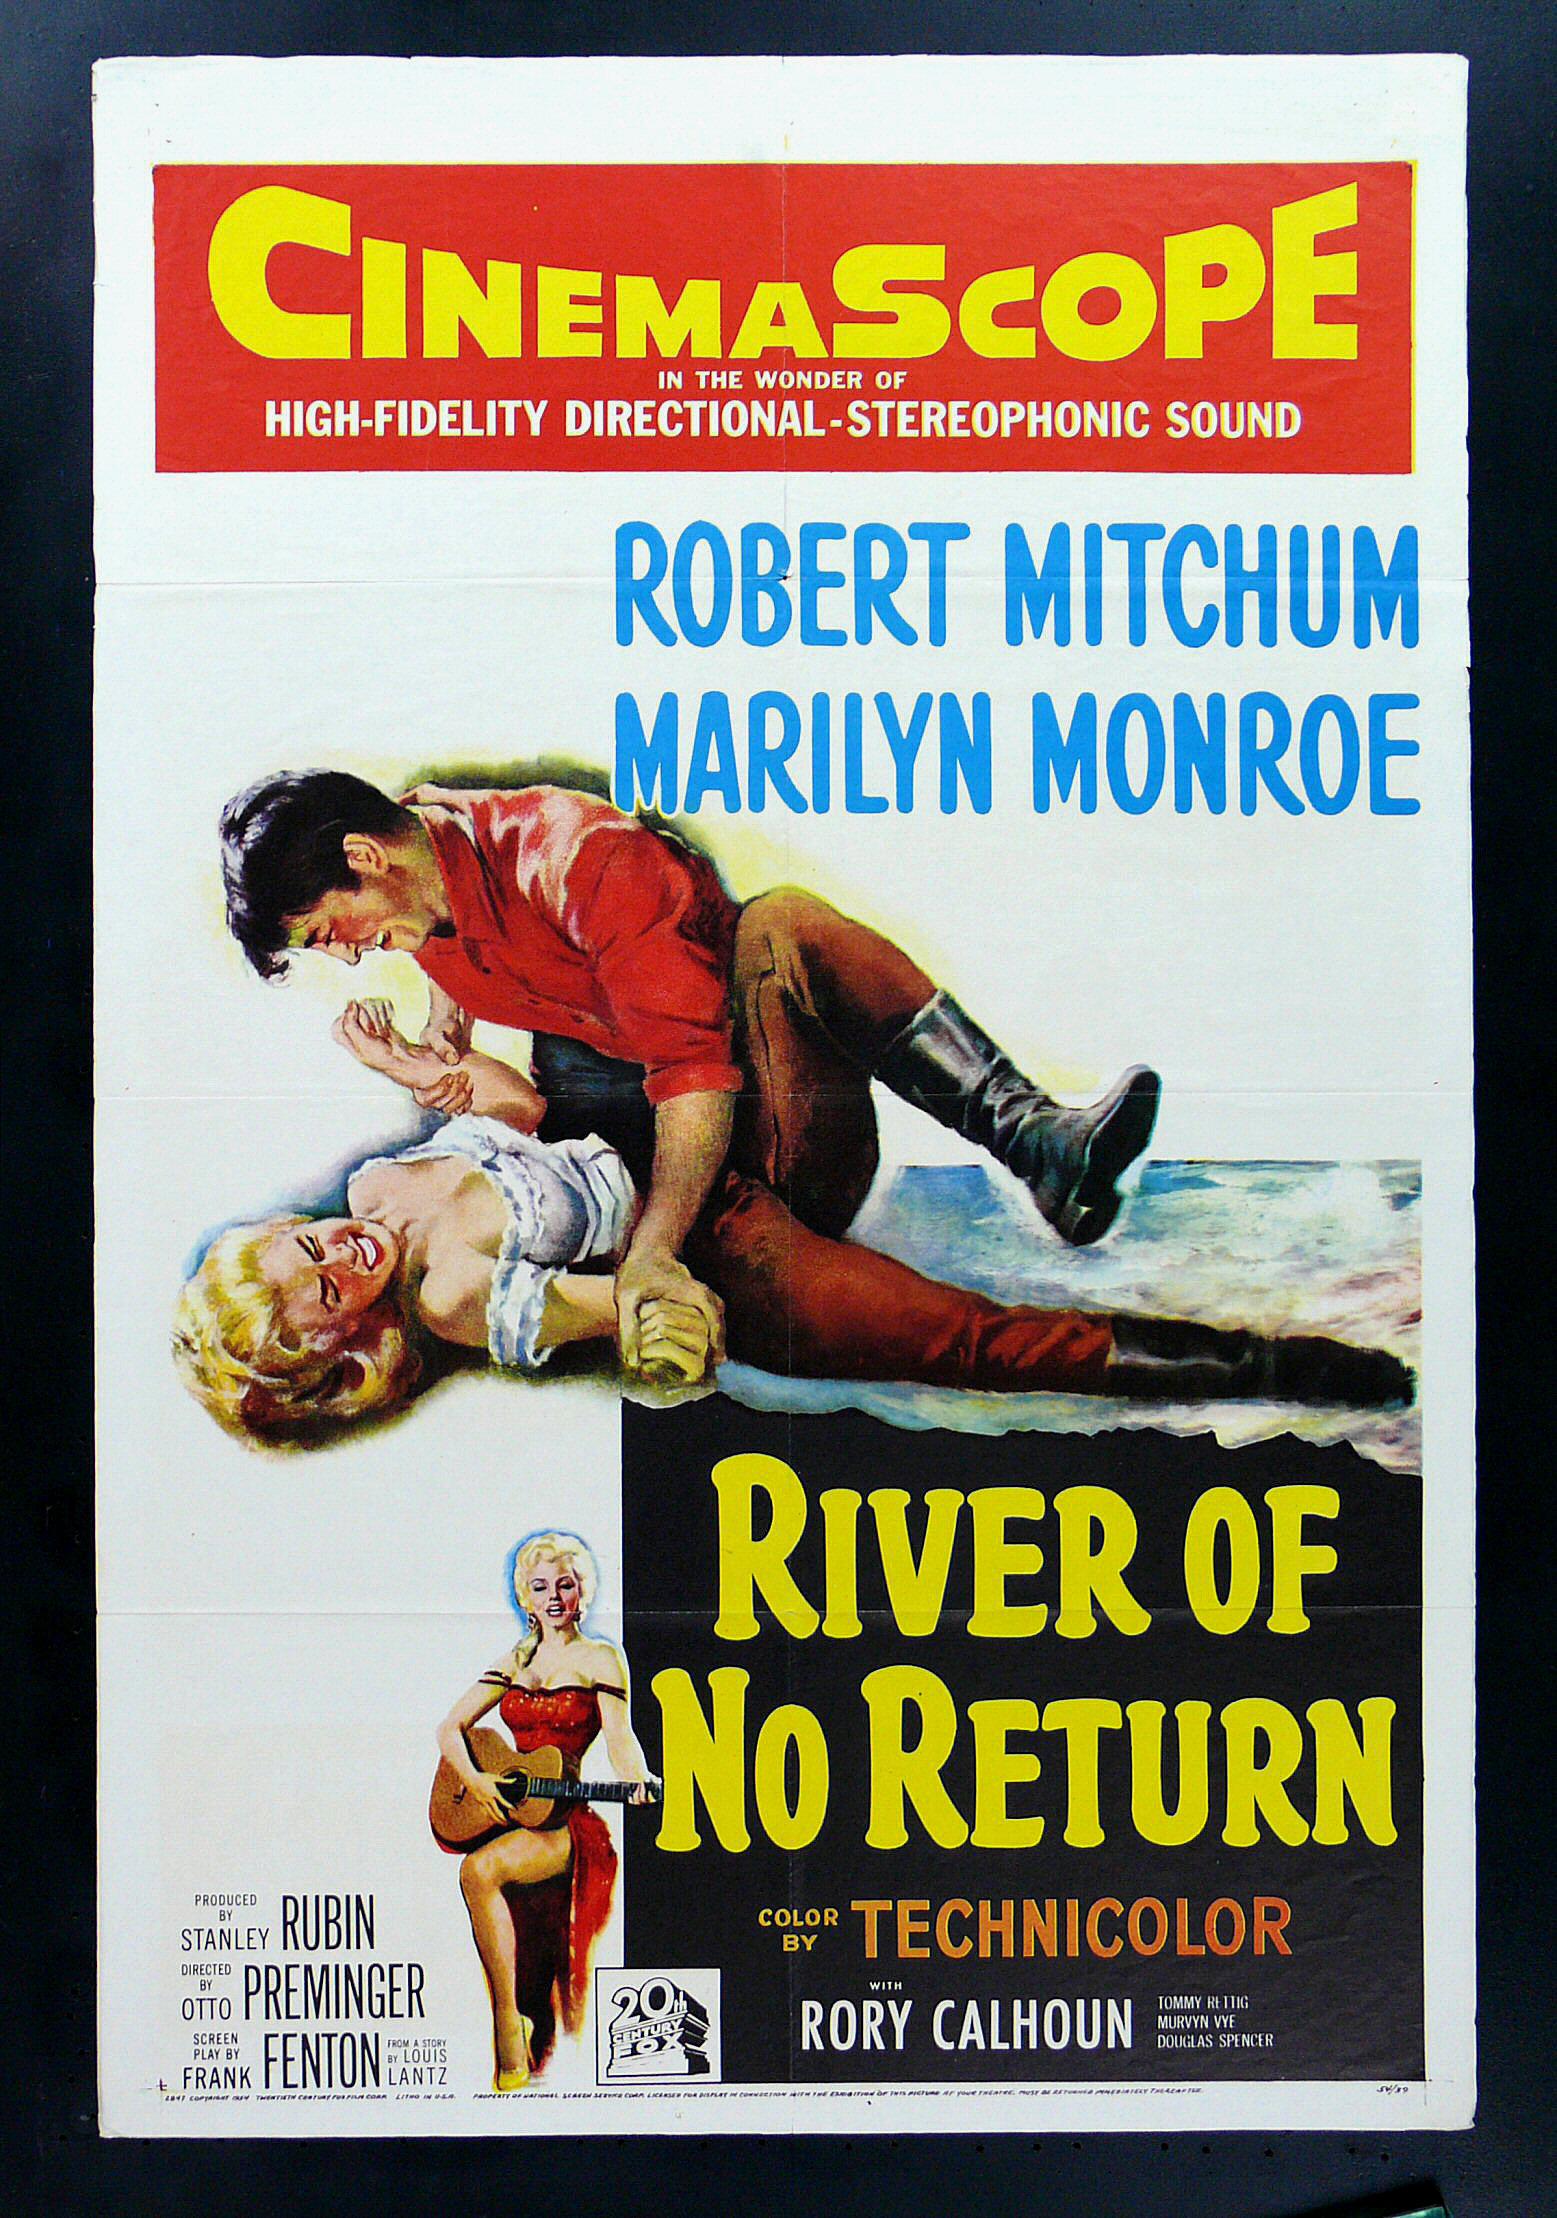 RIVER OF NO RETURN * MARILYN MONROE MOVIE POSTER 1954   eBay